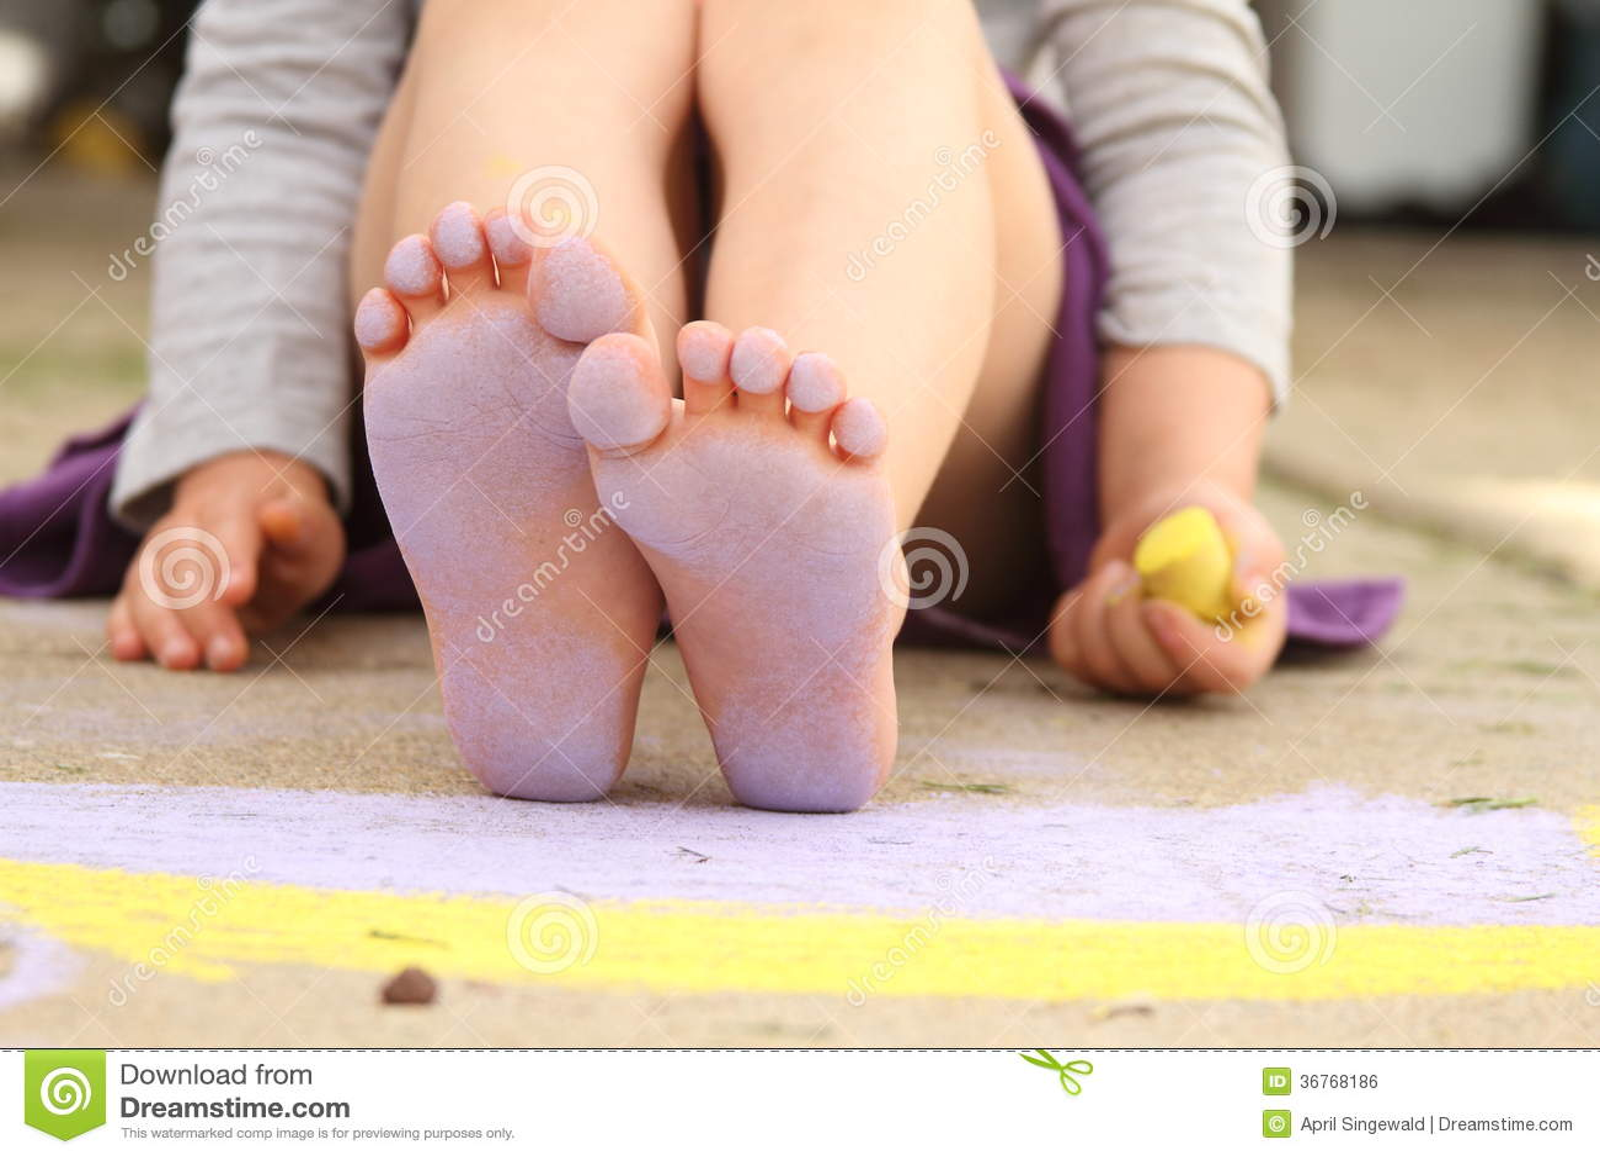 Sidewalk Chalk And A Little Girls Feet Covered In Purple Chalk Dust